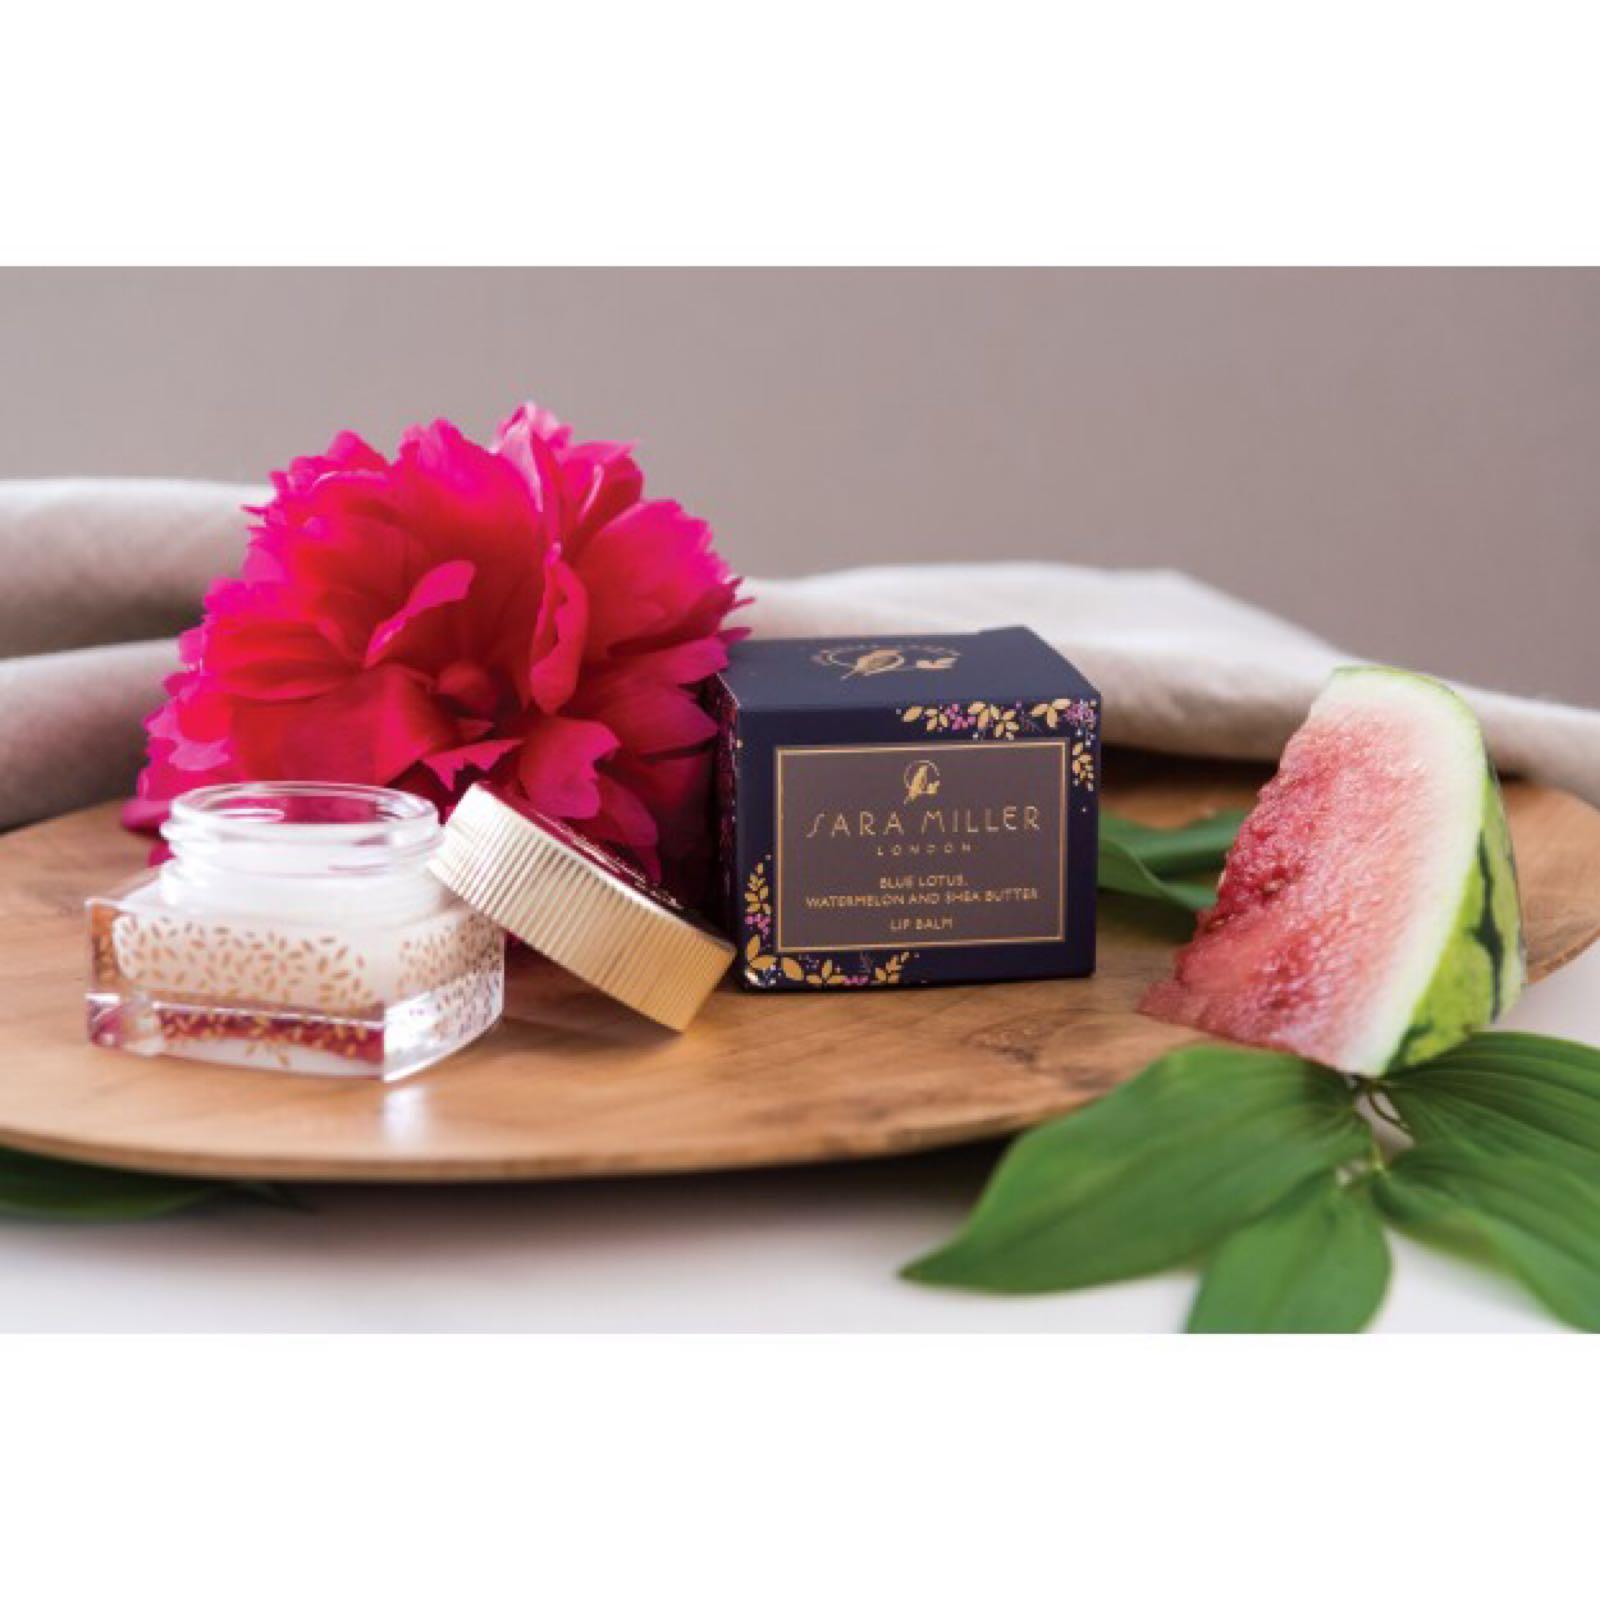 Sara Miller blue lotus and Watermelon Shea butter lip balm